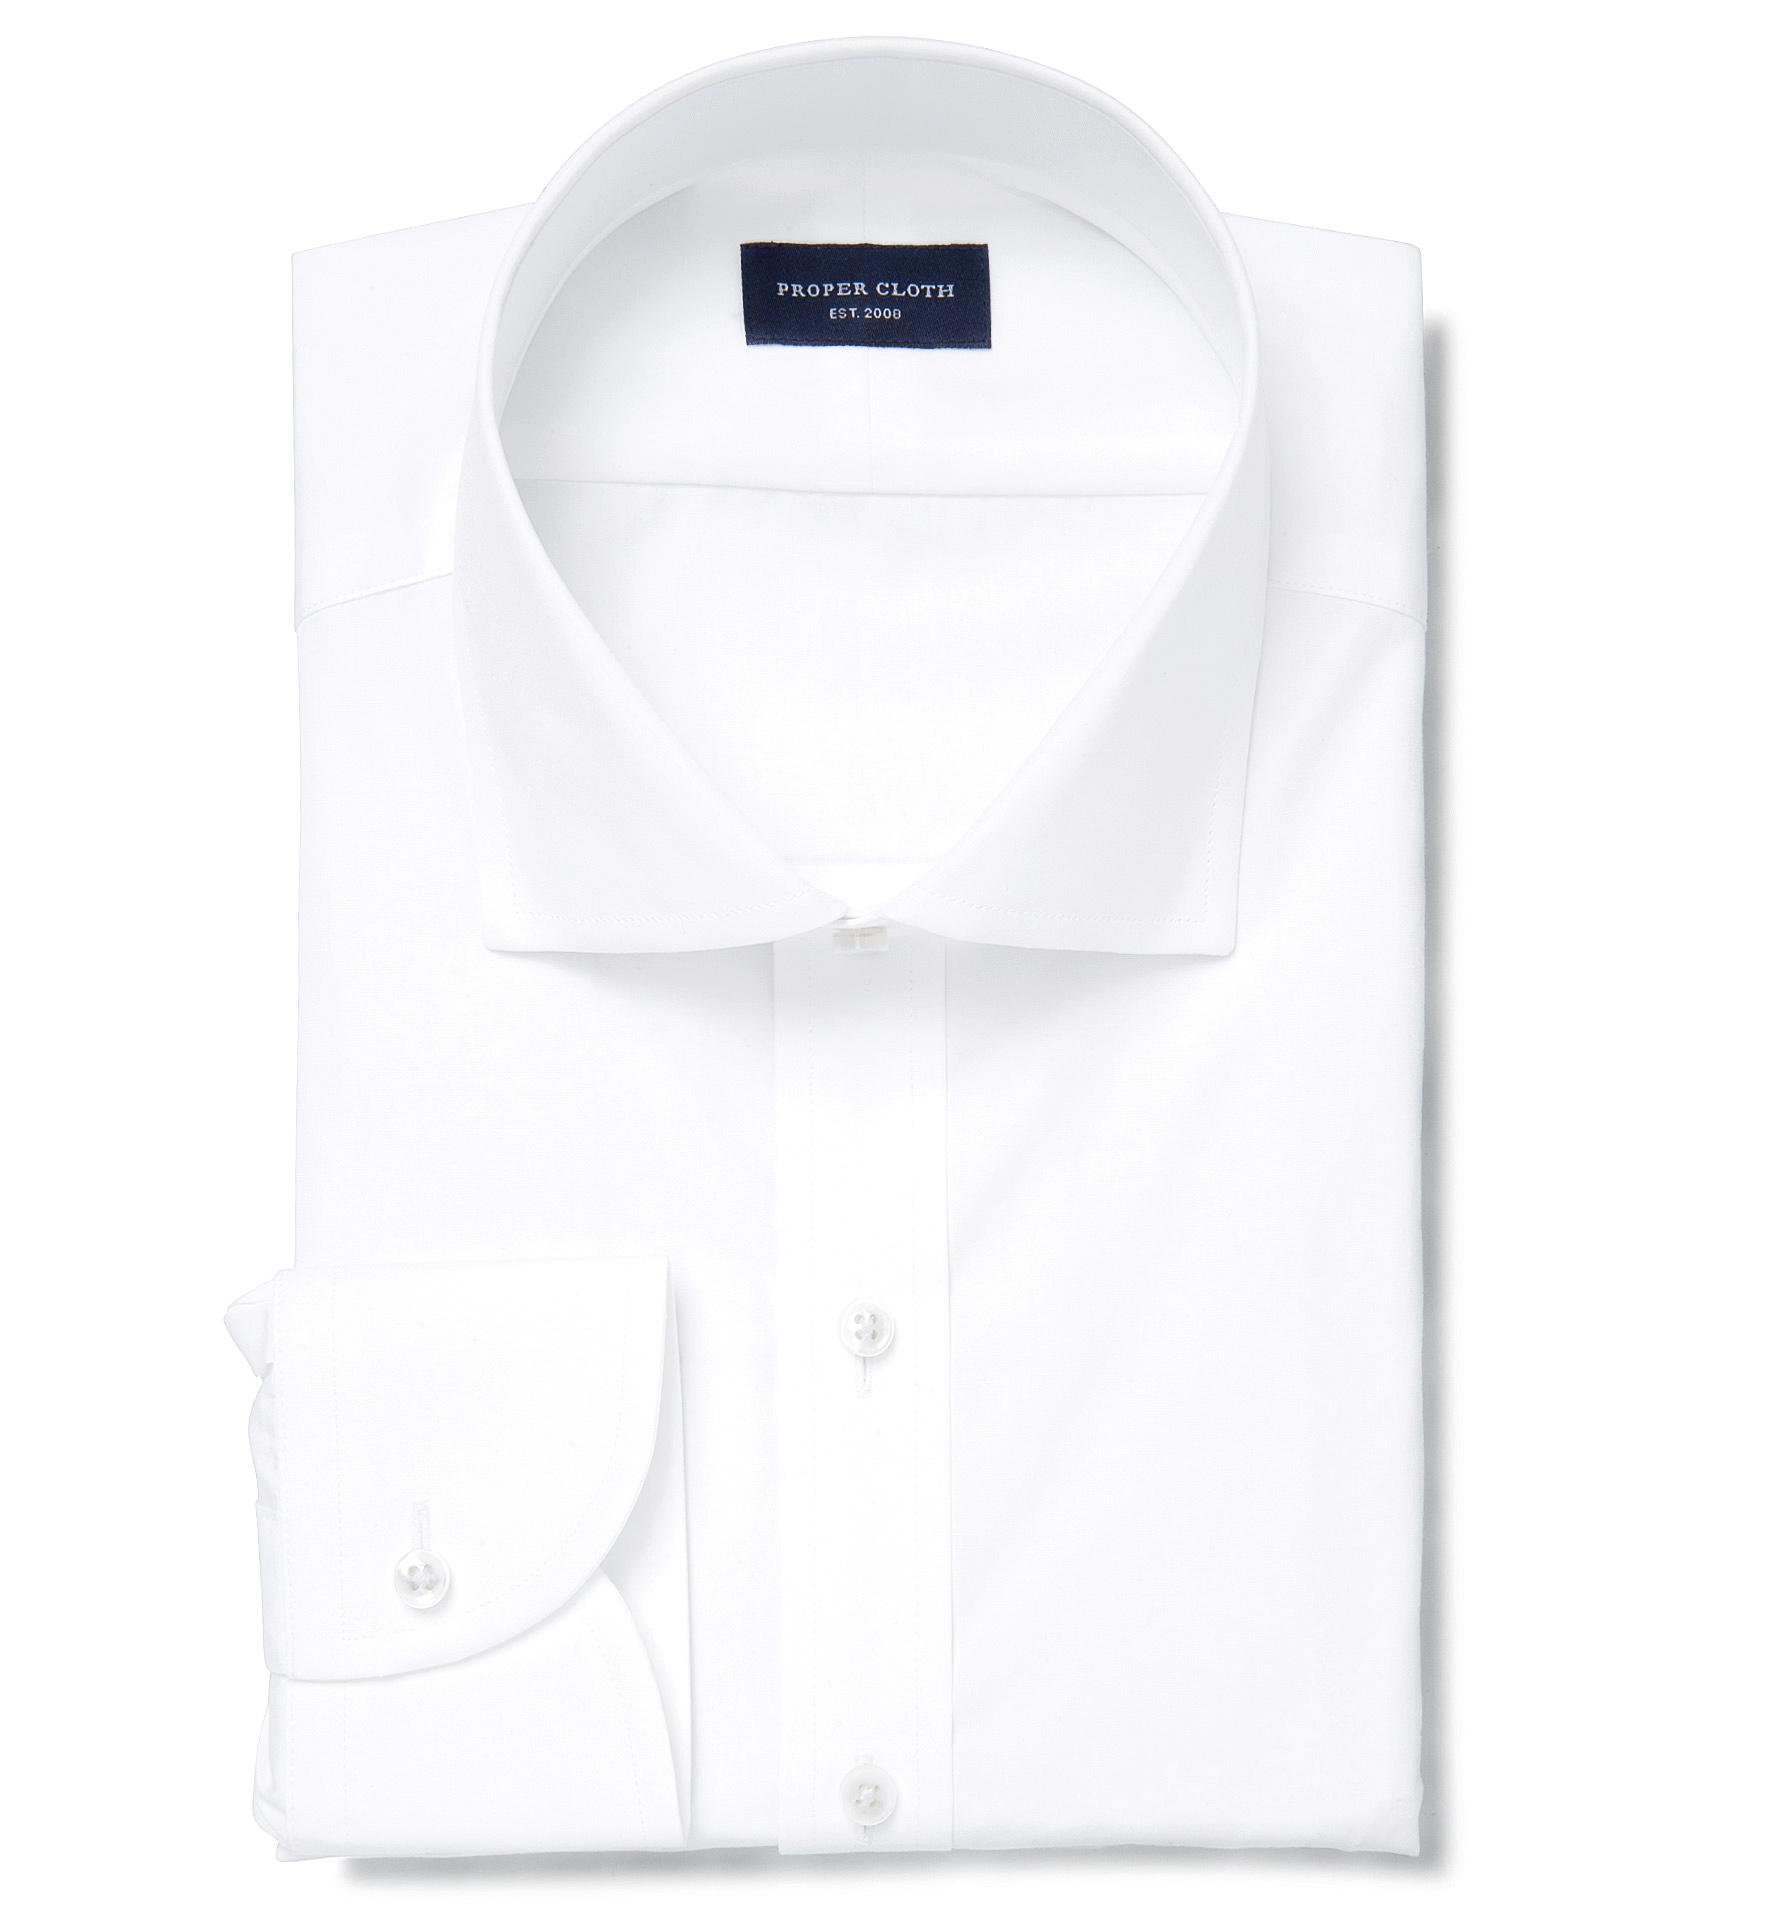 Thomas Mason White Luxury Broadcloth Dress Shirt By Proper